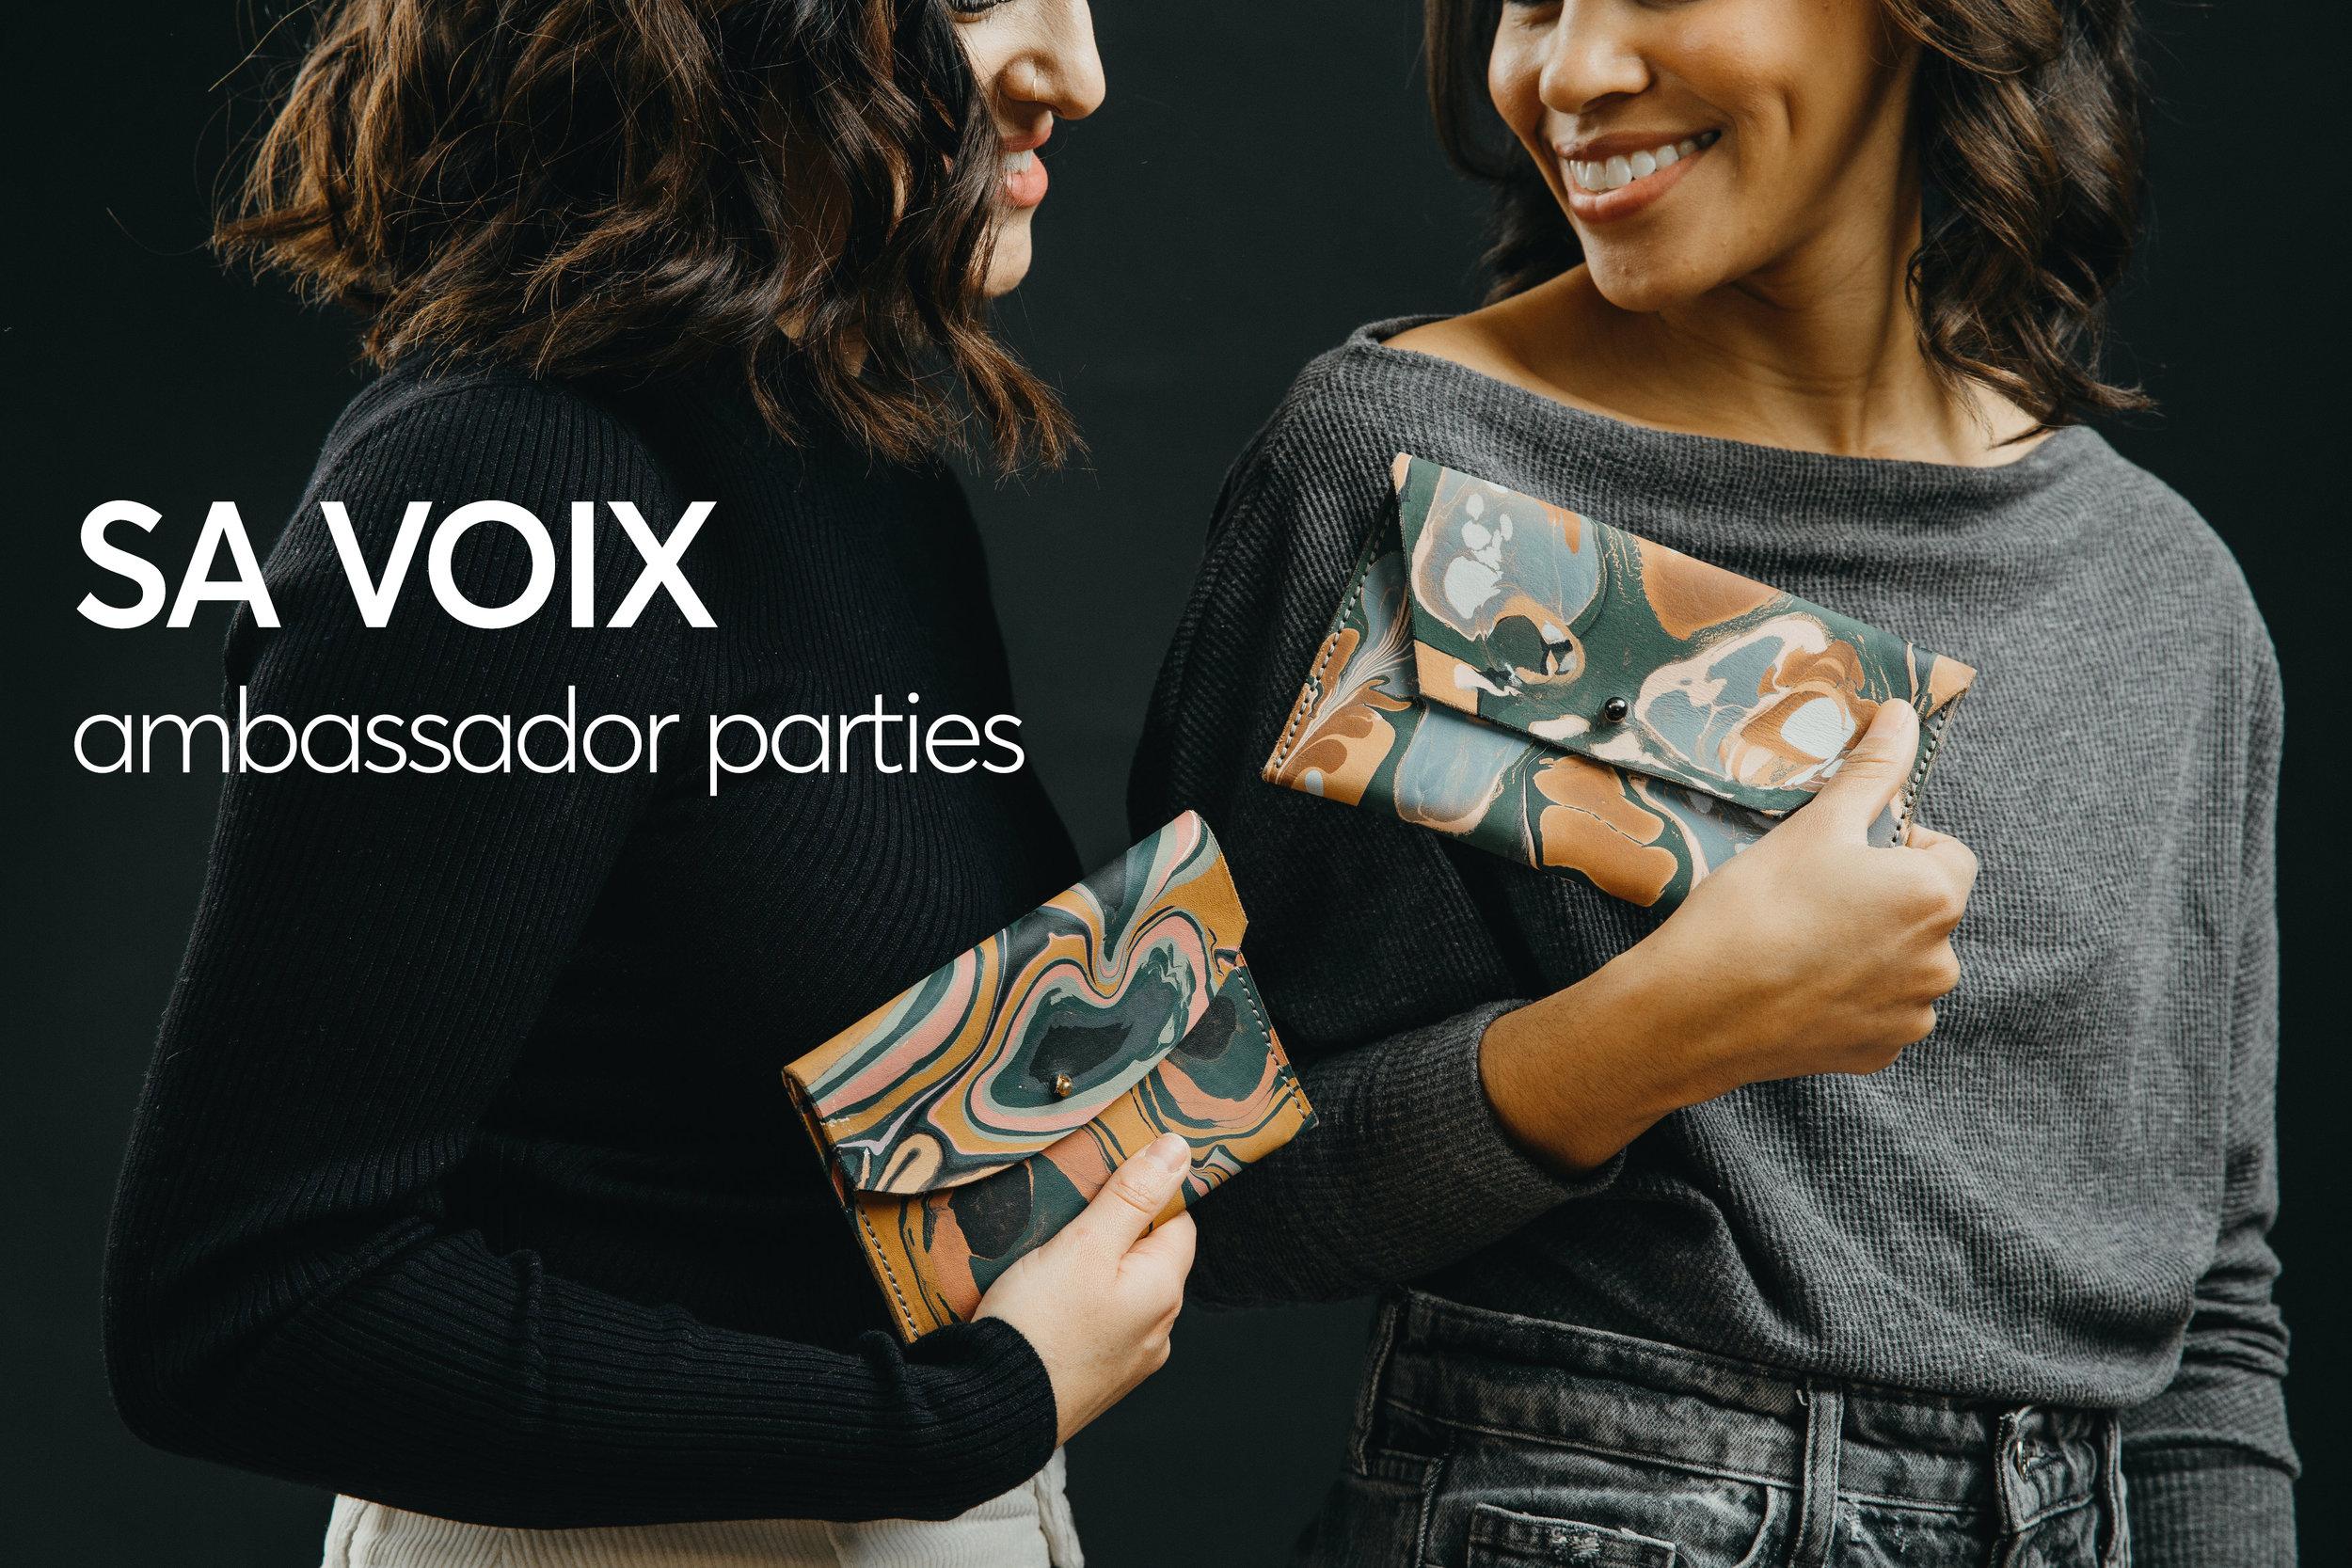 ambassador parties.jpg